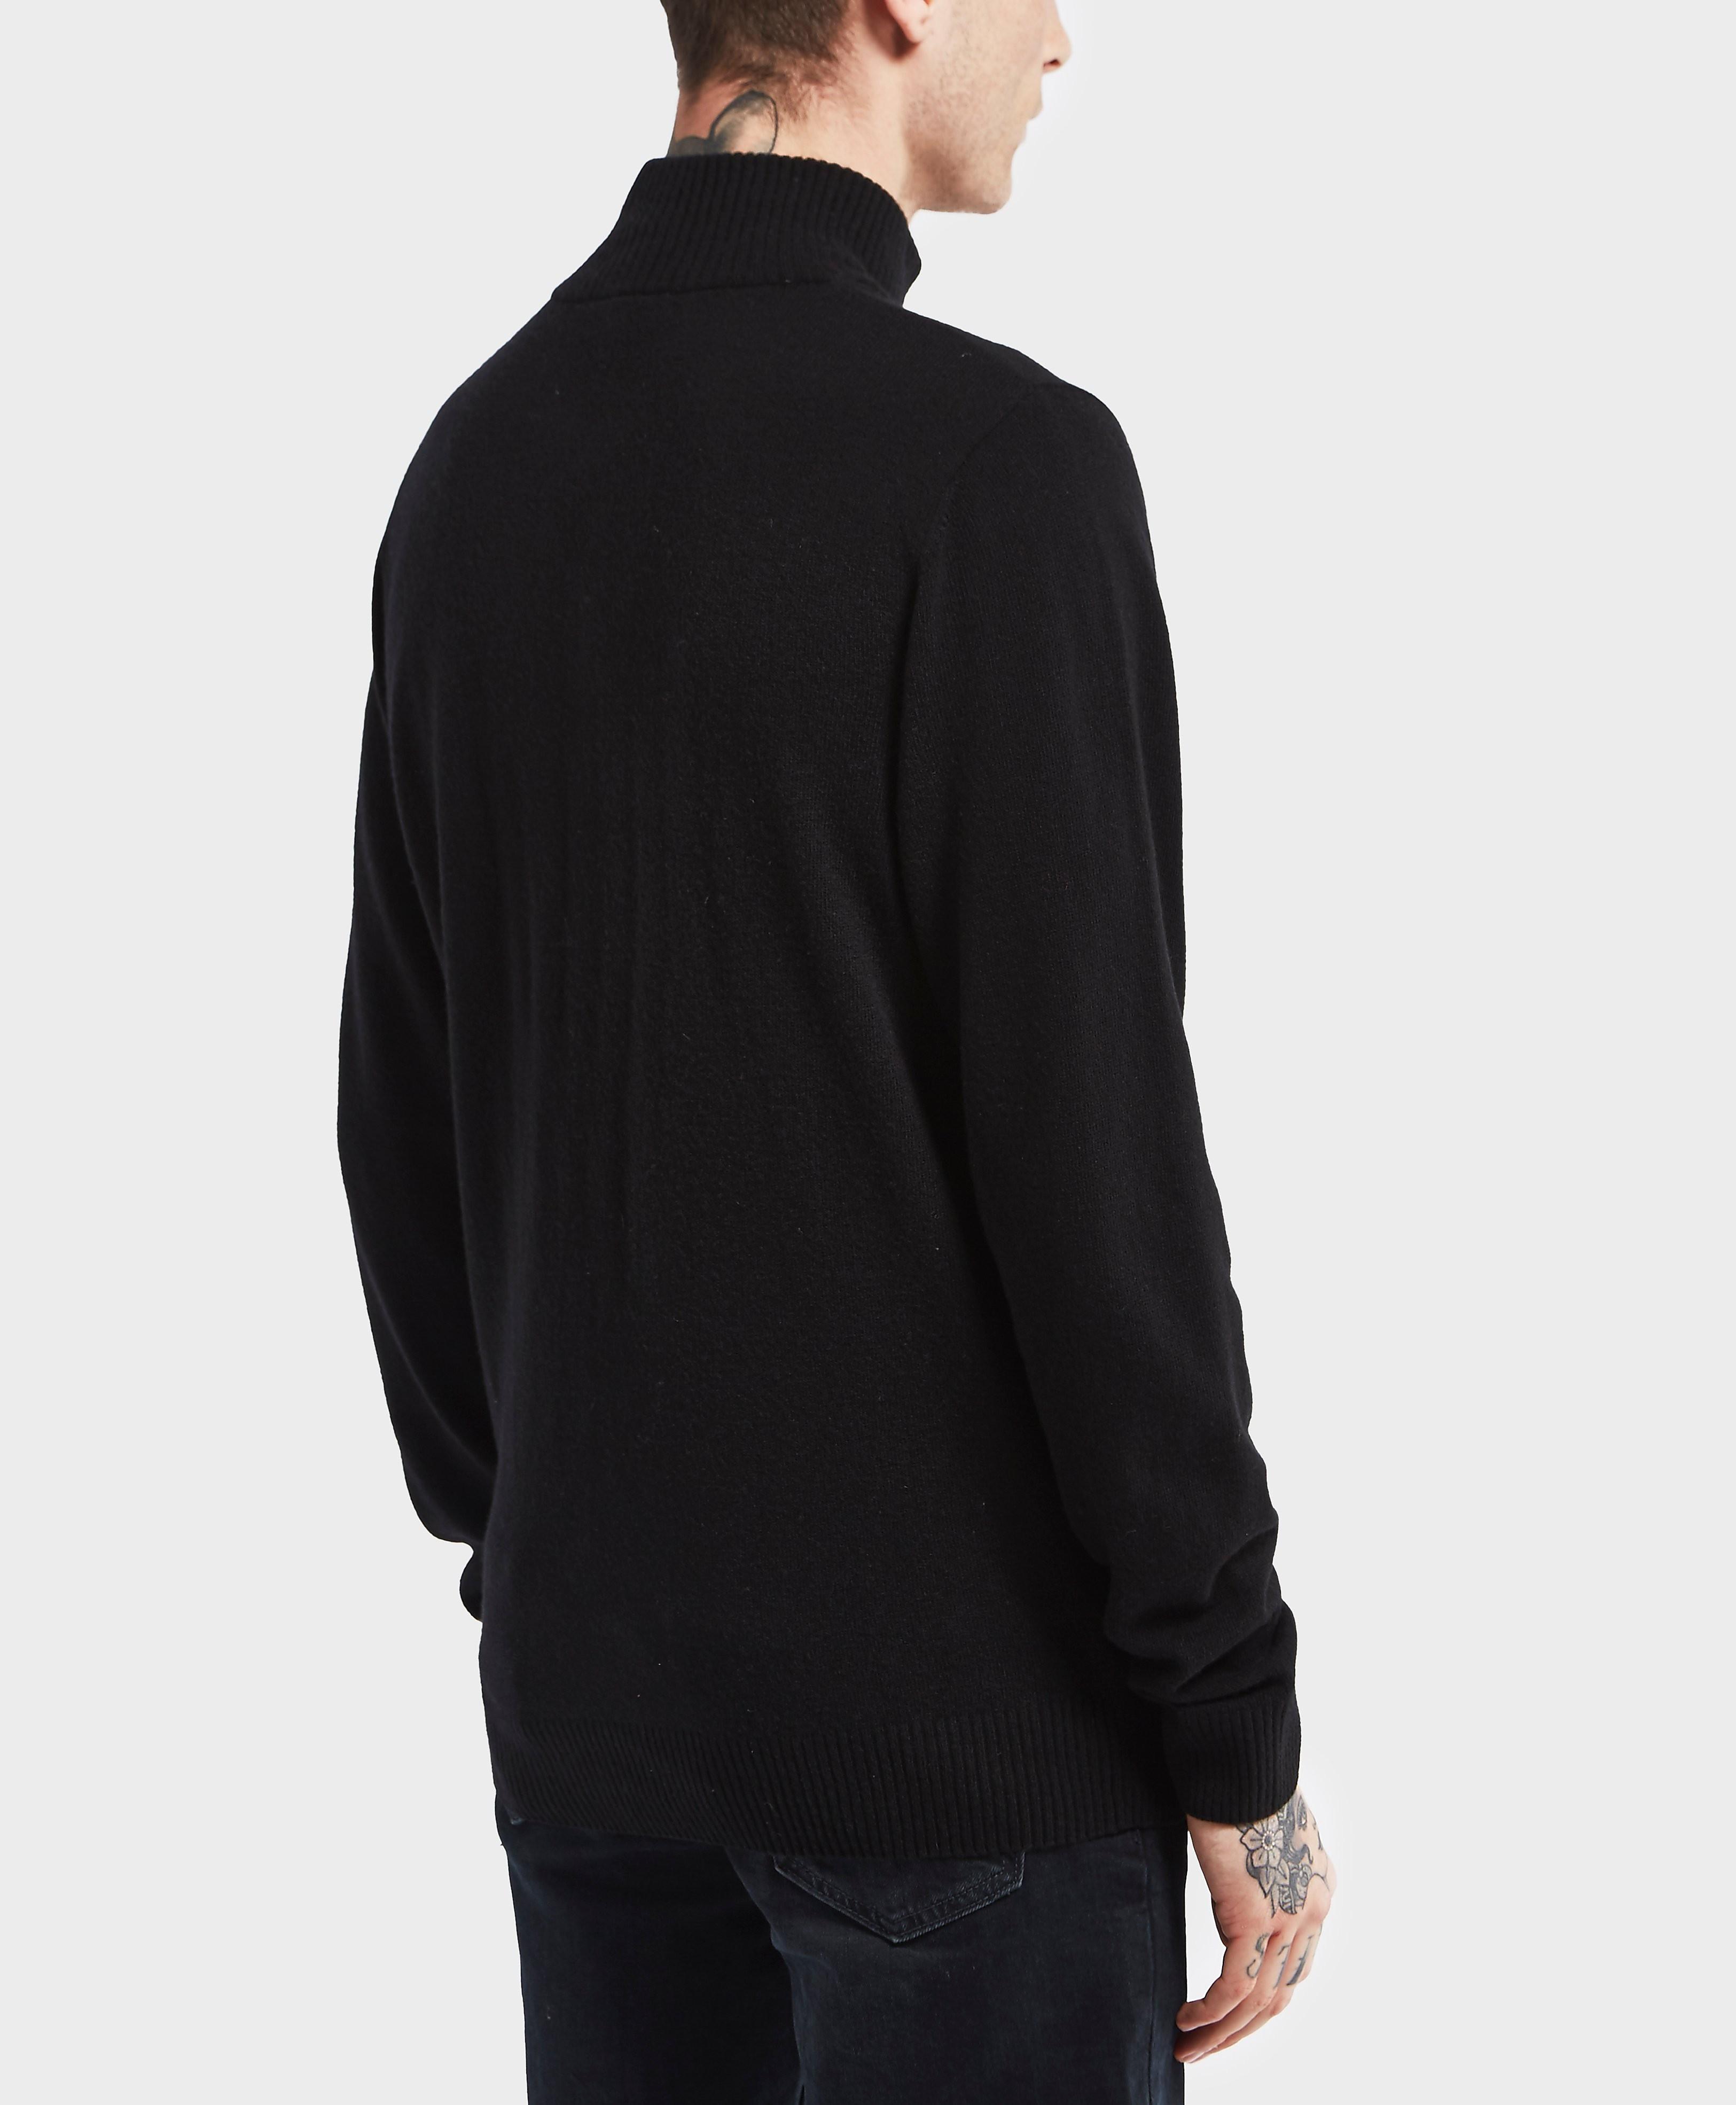 Lacoste Half Zip Knitted Jumper